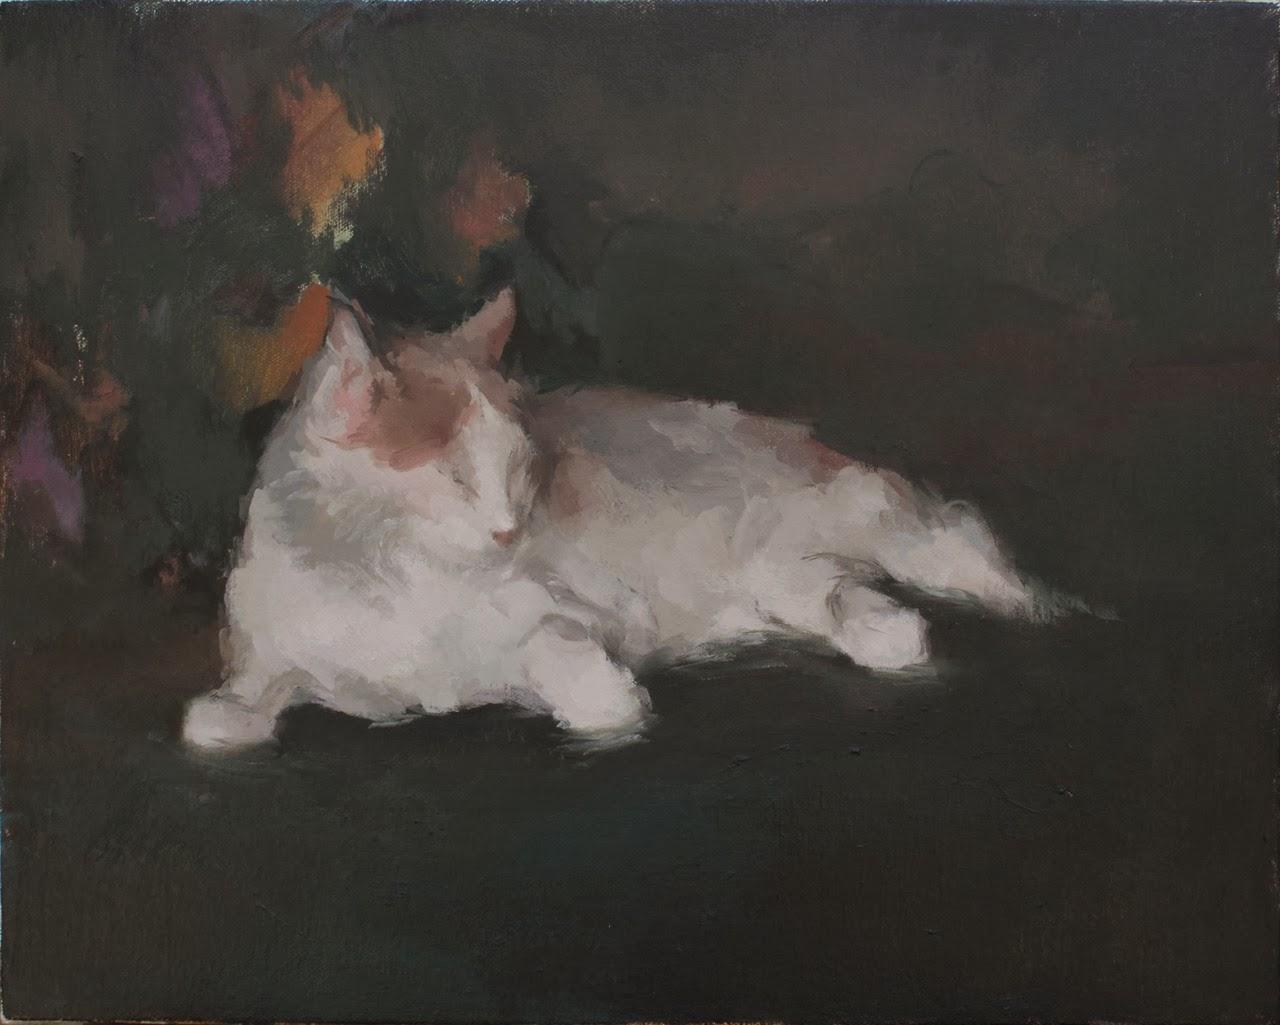 http://3.bp.blogspot.com/-_zvCqTSxshE/UuMq50RxgXI/AAAAAAAAFUE/RBcv8SOhoOg/s1600/michelle+farro+jack+birds+cat.jpg